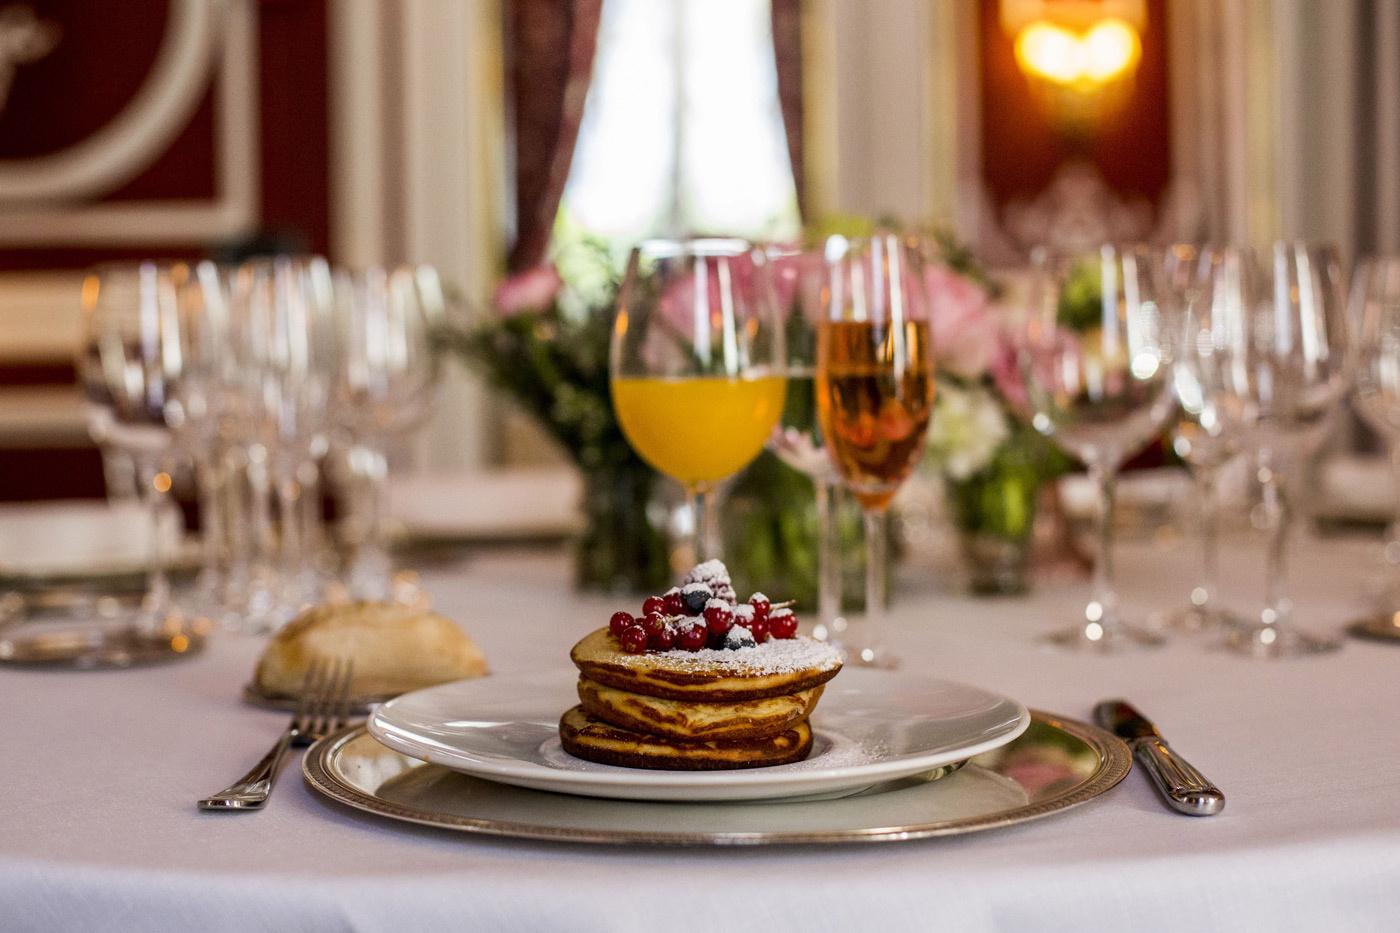 calista one blog lista de bodas online ideas regalos febrero17 4.